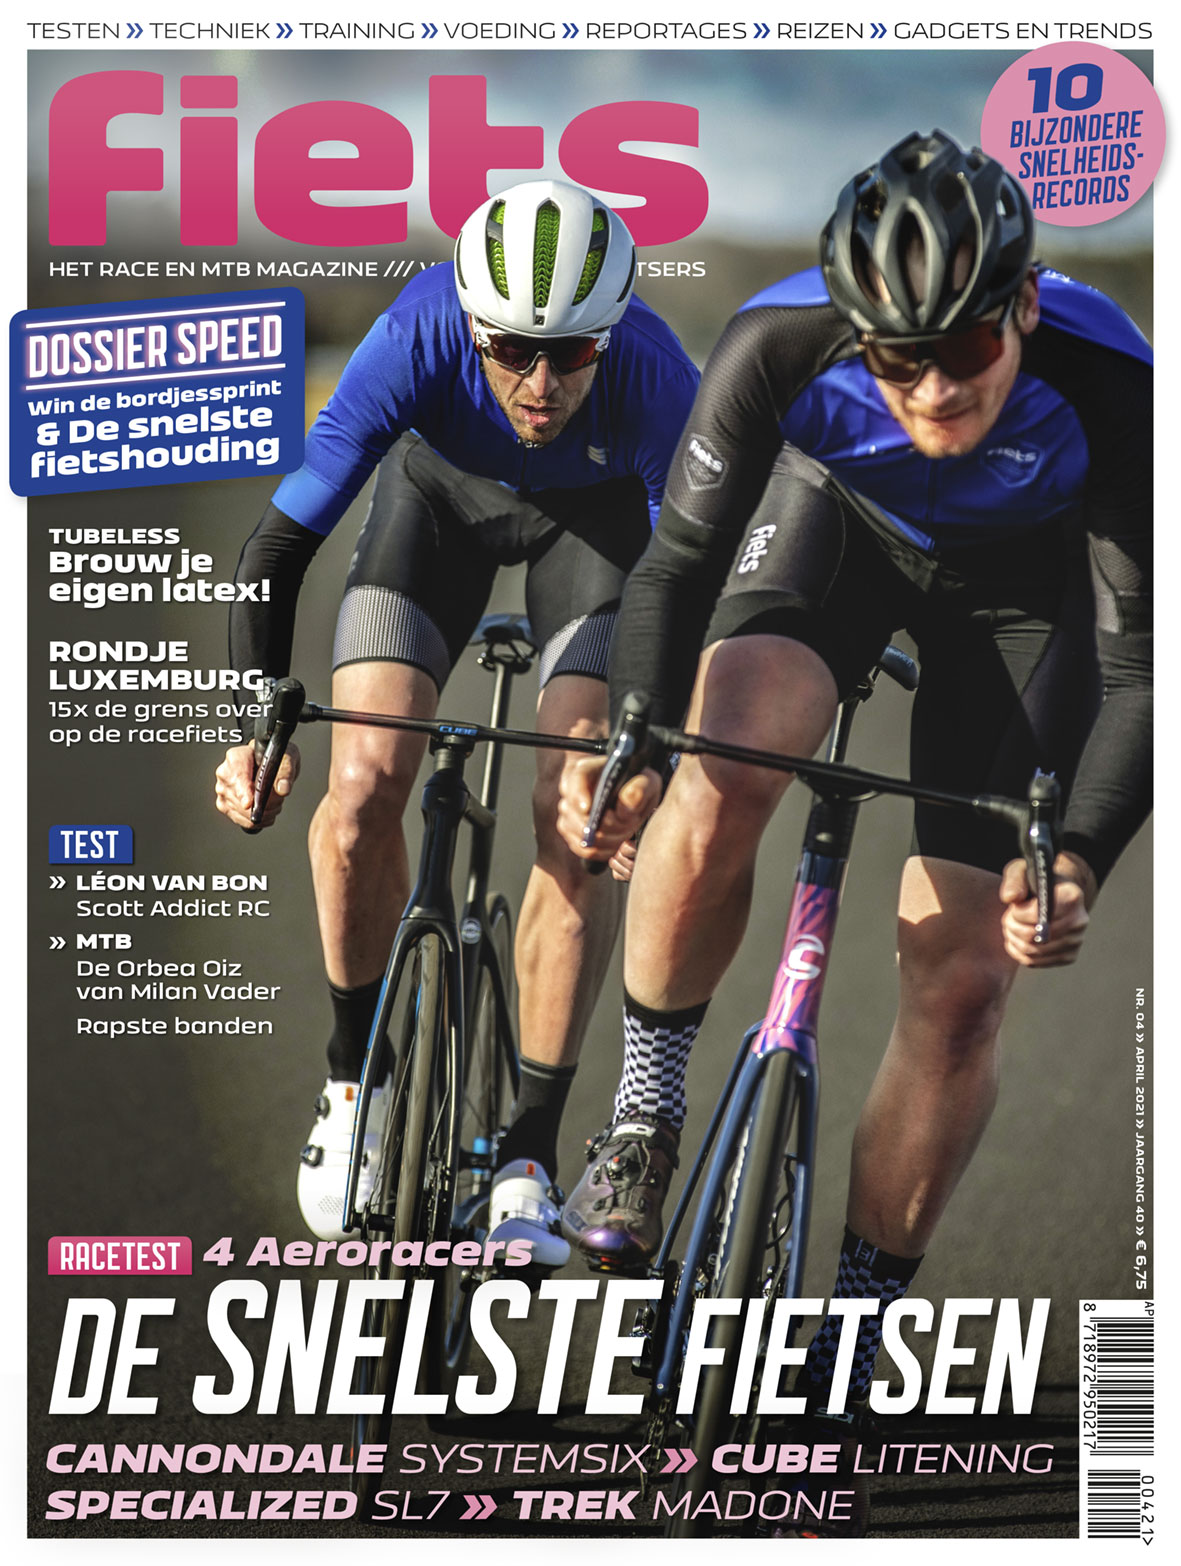 Fiets editie 4 cover